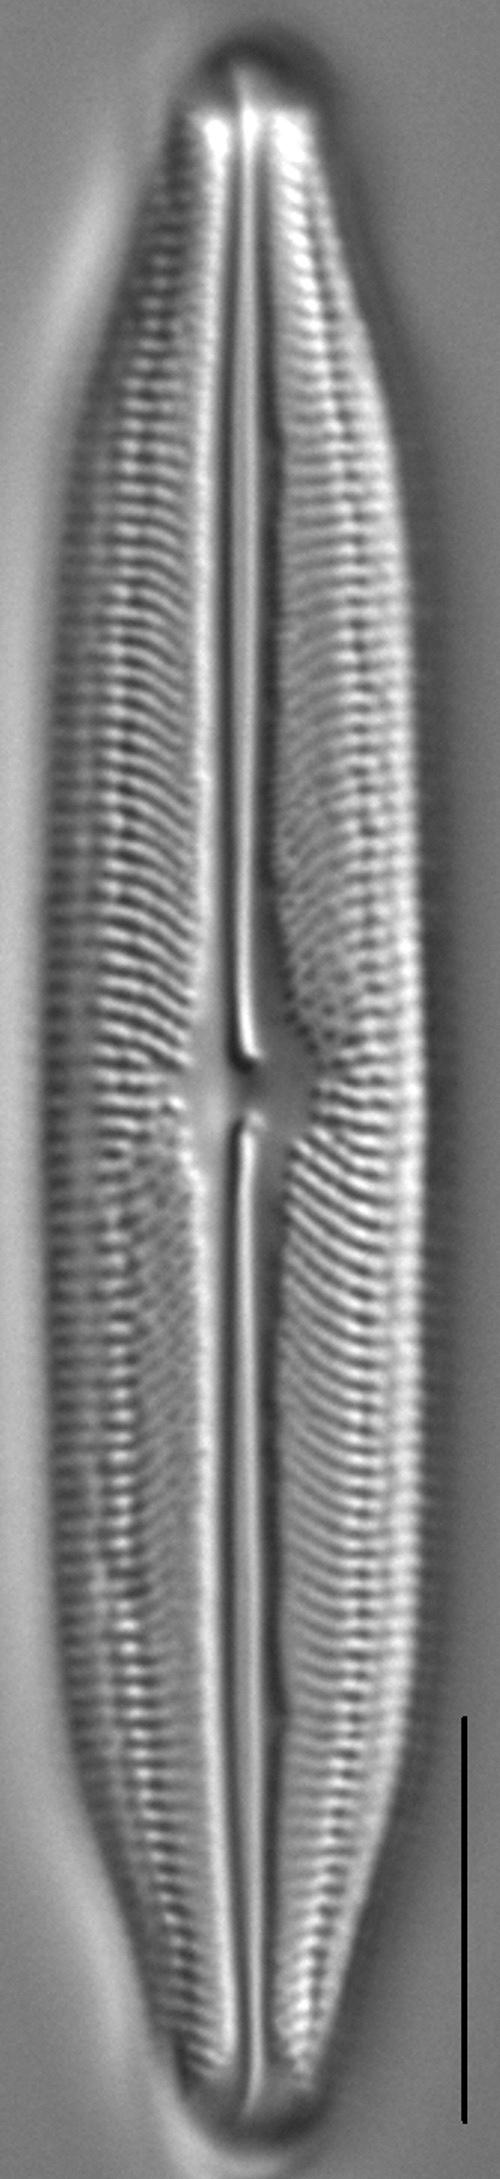 Neidiopsis weilandii LM5